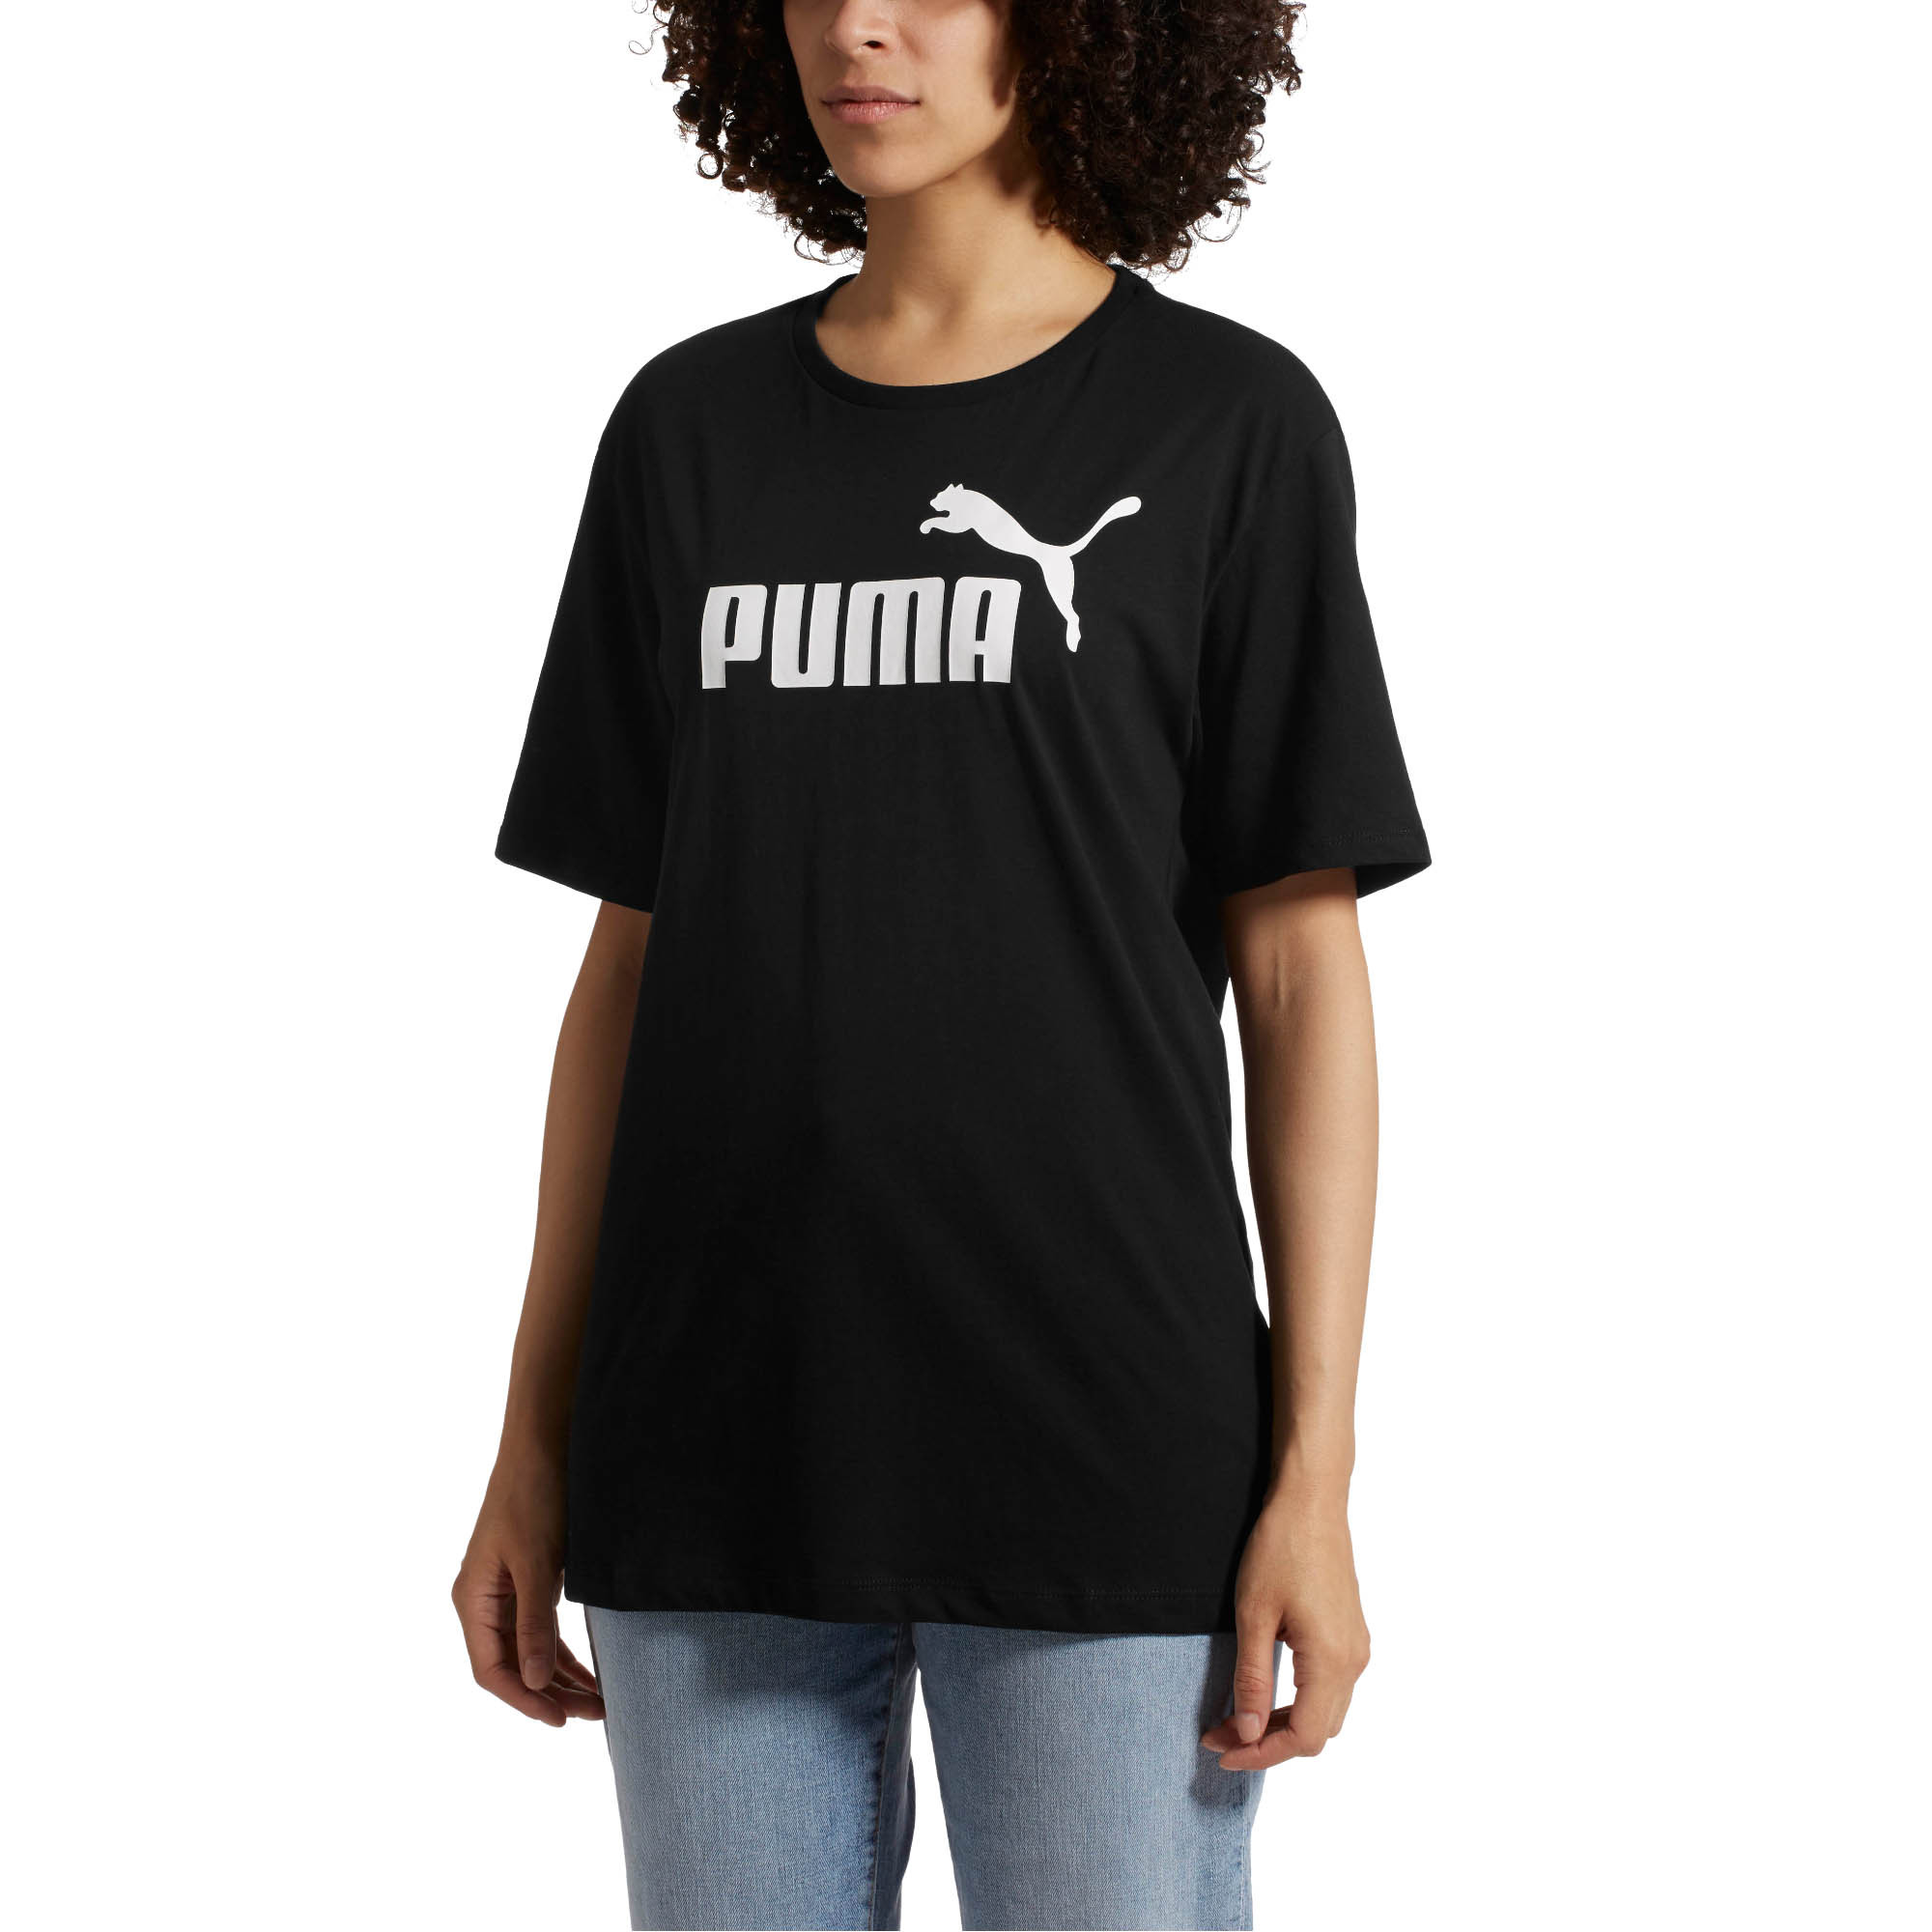 Activewear Tops Activewear Puma Essential Logo Womens Ladies Sports Fashion Boyfriend T-shirt Tee